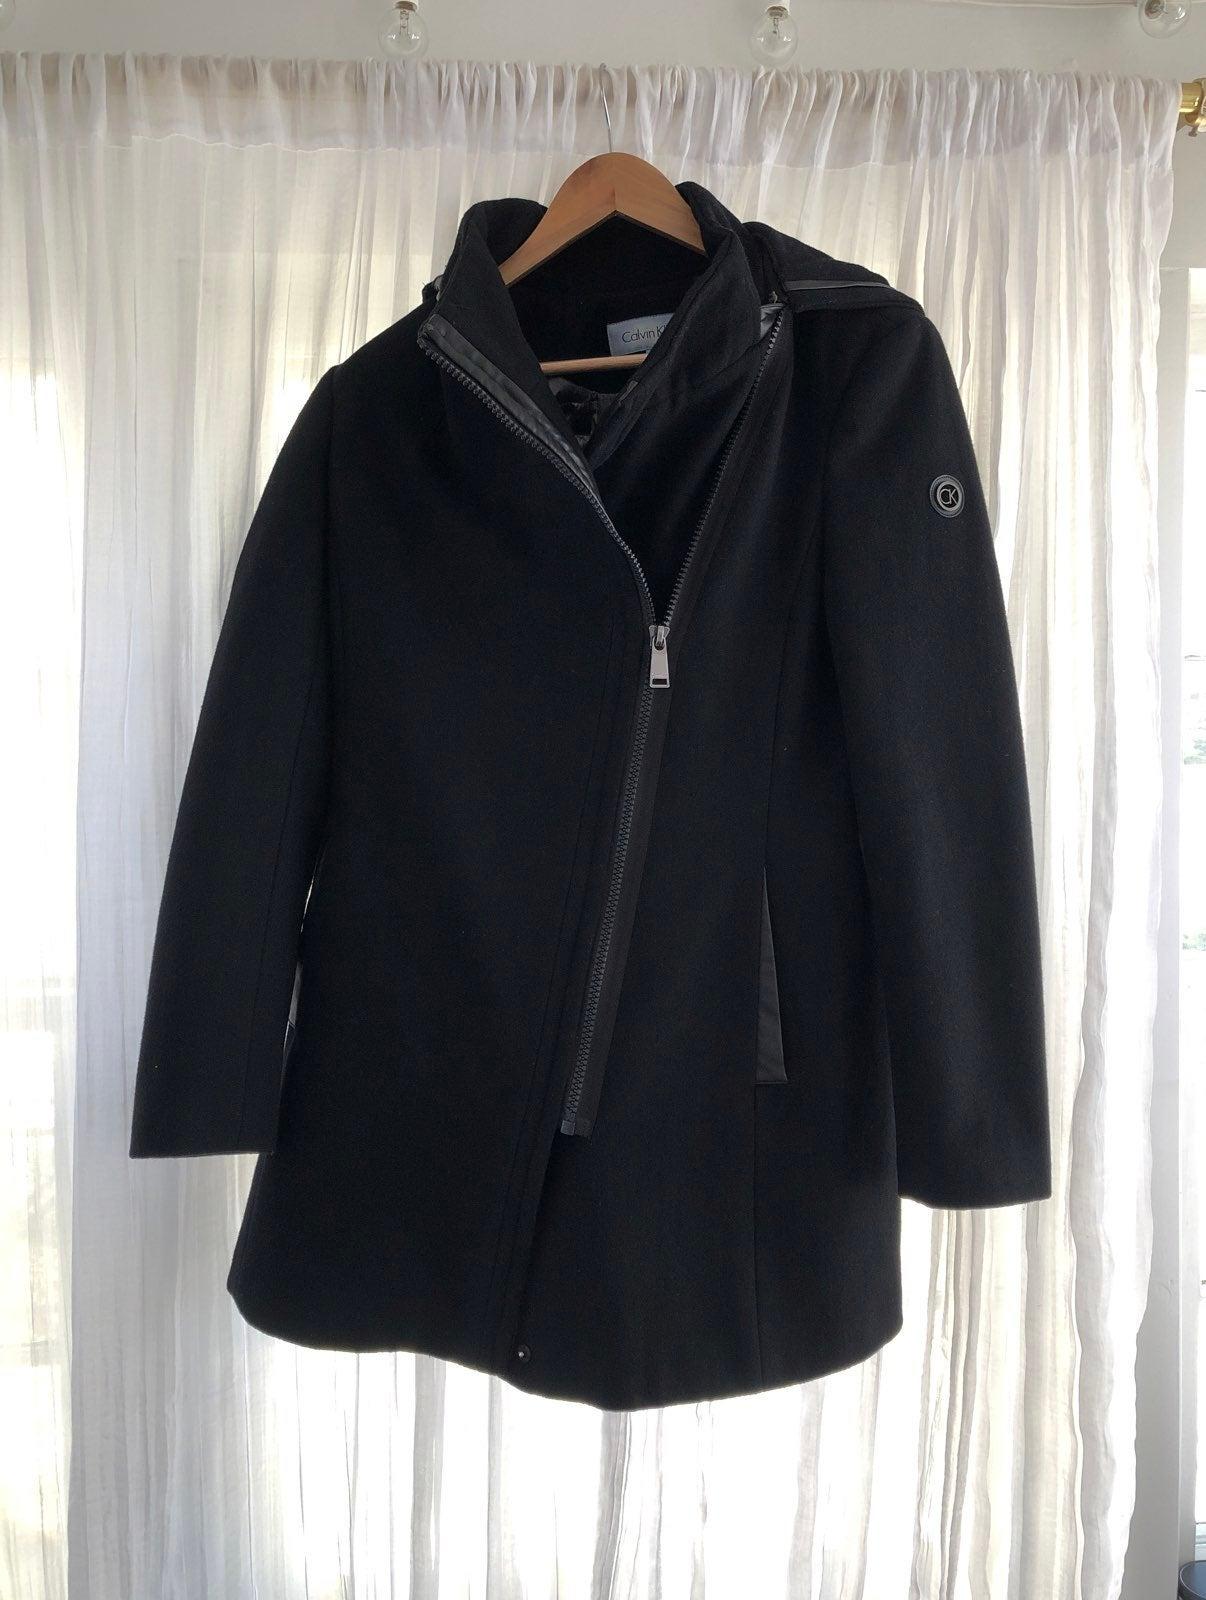 Calvin Klein Woman's Wool coat